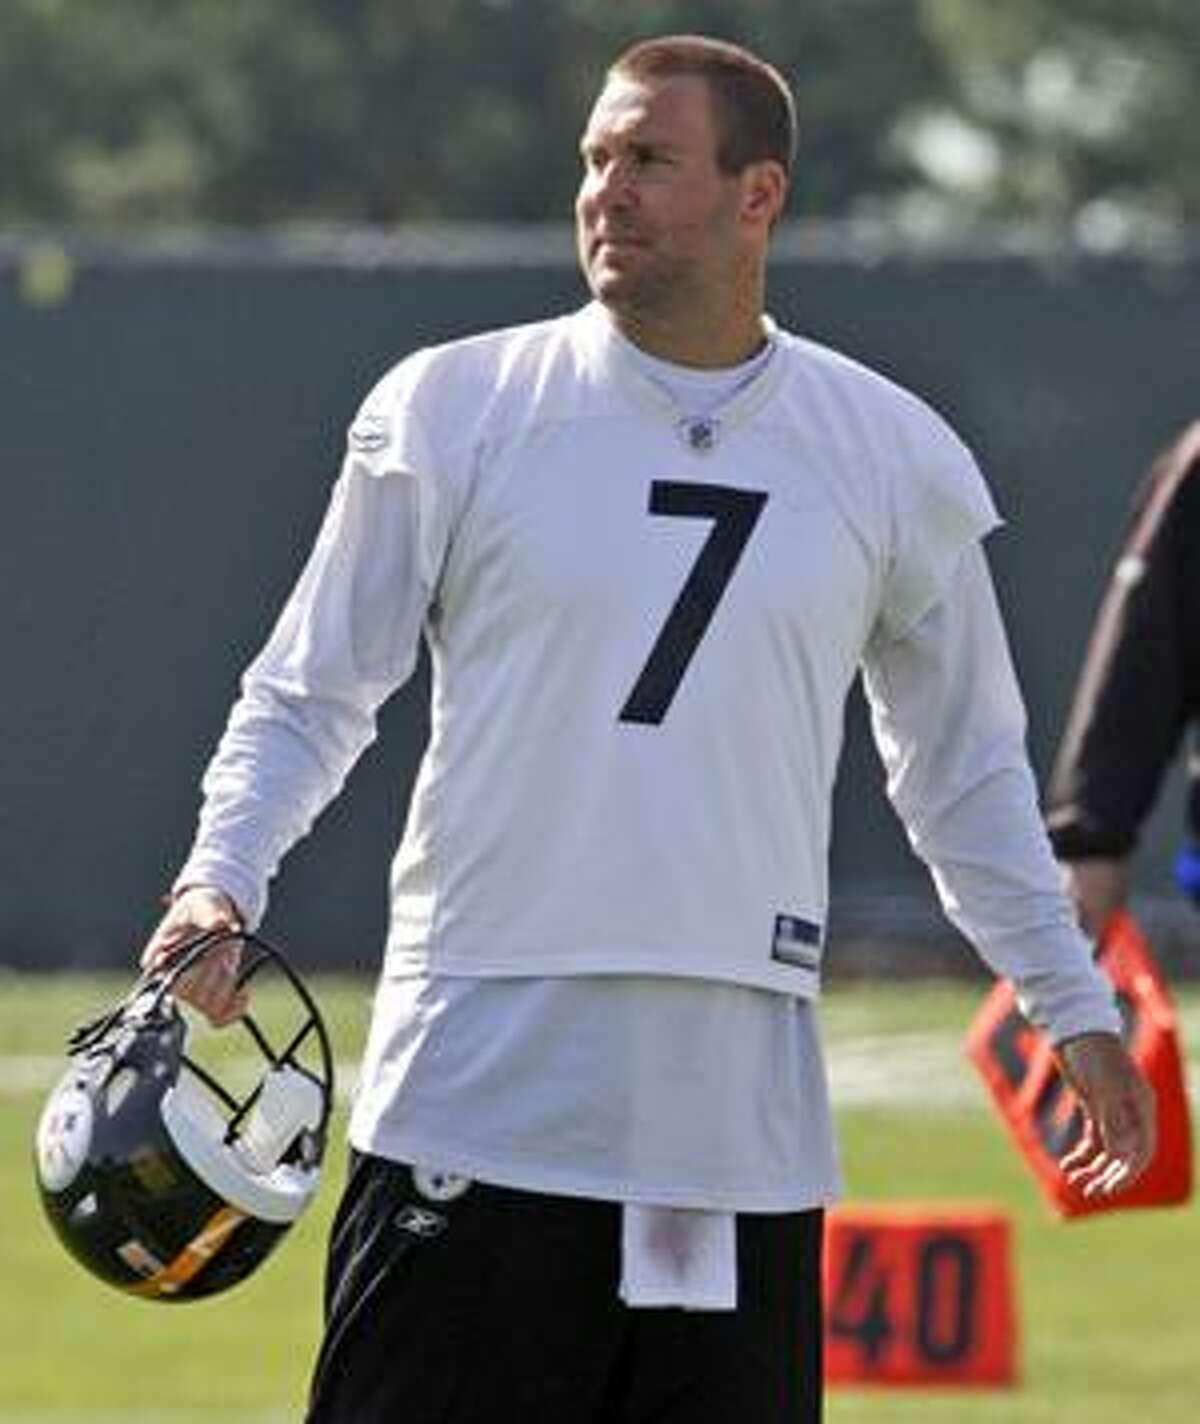 Pittsburgh Steelers quarterback Ben Roethlisberger (7) participates in the NFL team's practice in Pittsburgh Monday, April 19, 2010. (AP Photo/Gene J. Puskar)